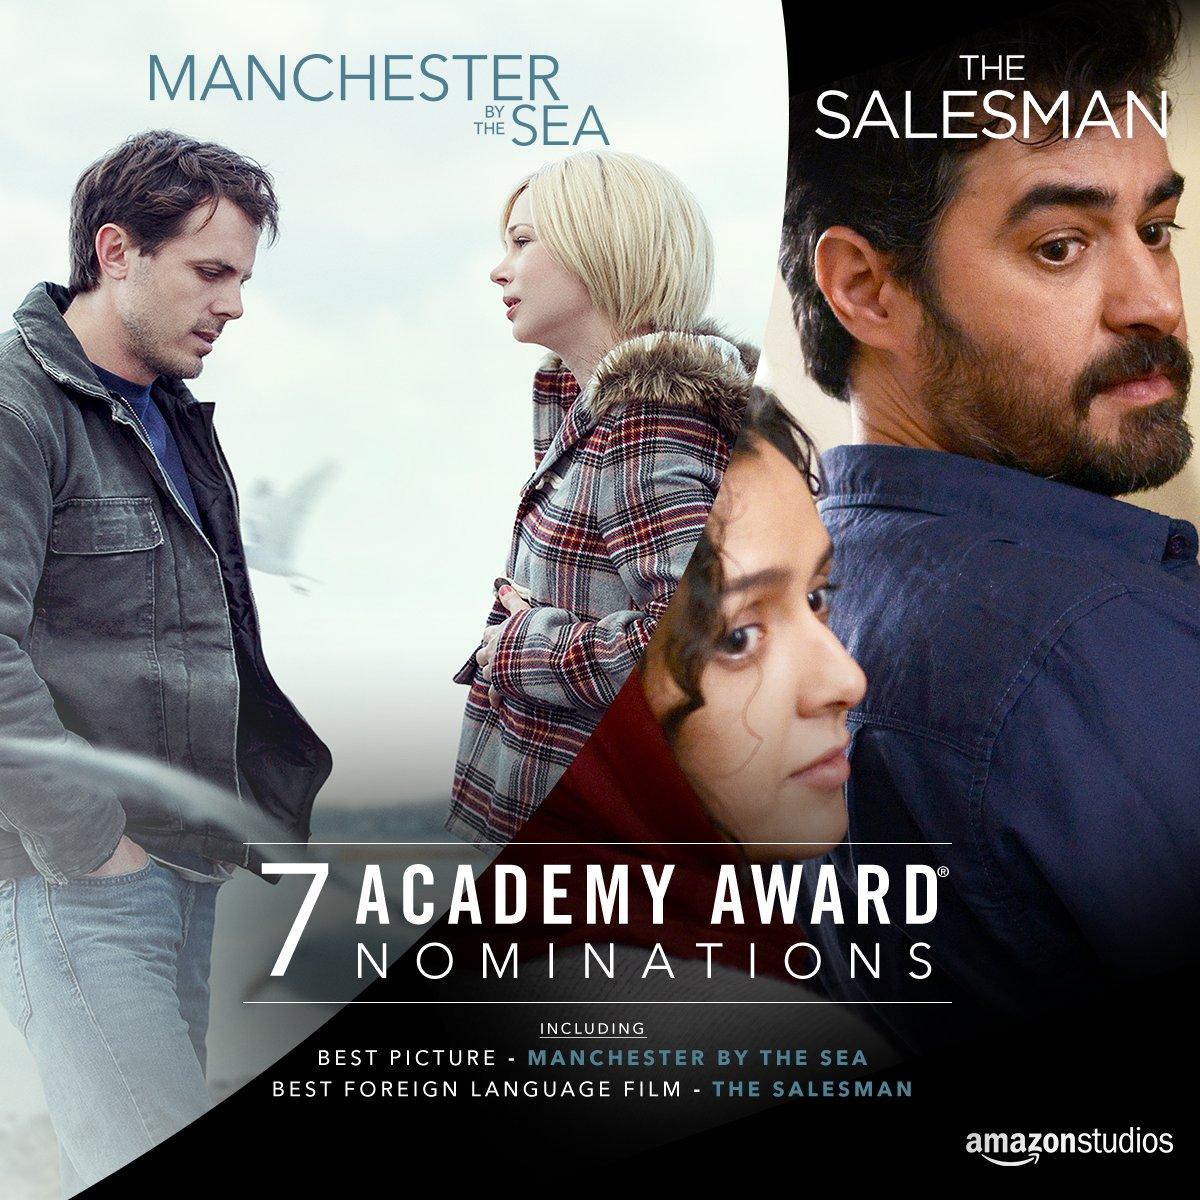 amazon-nominations.jpg